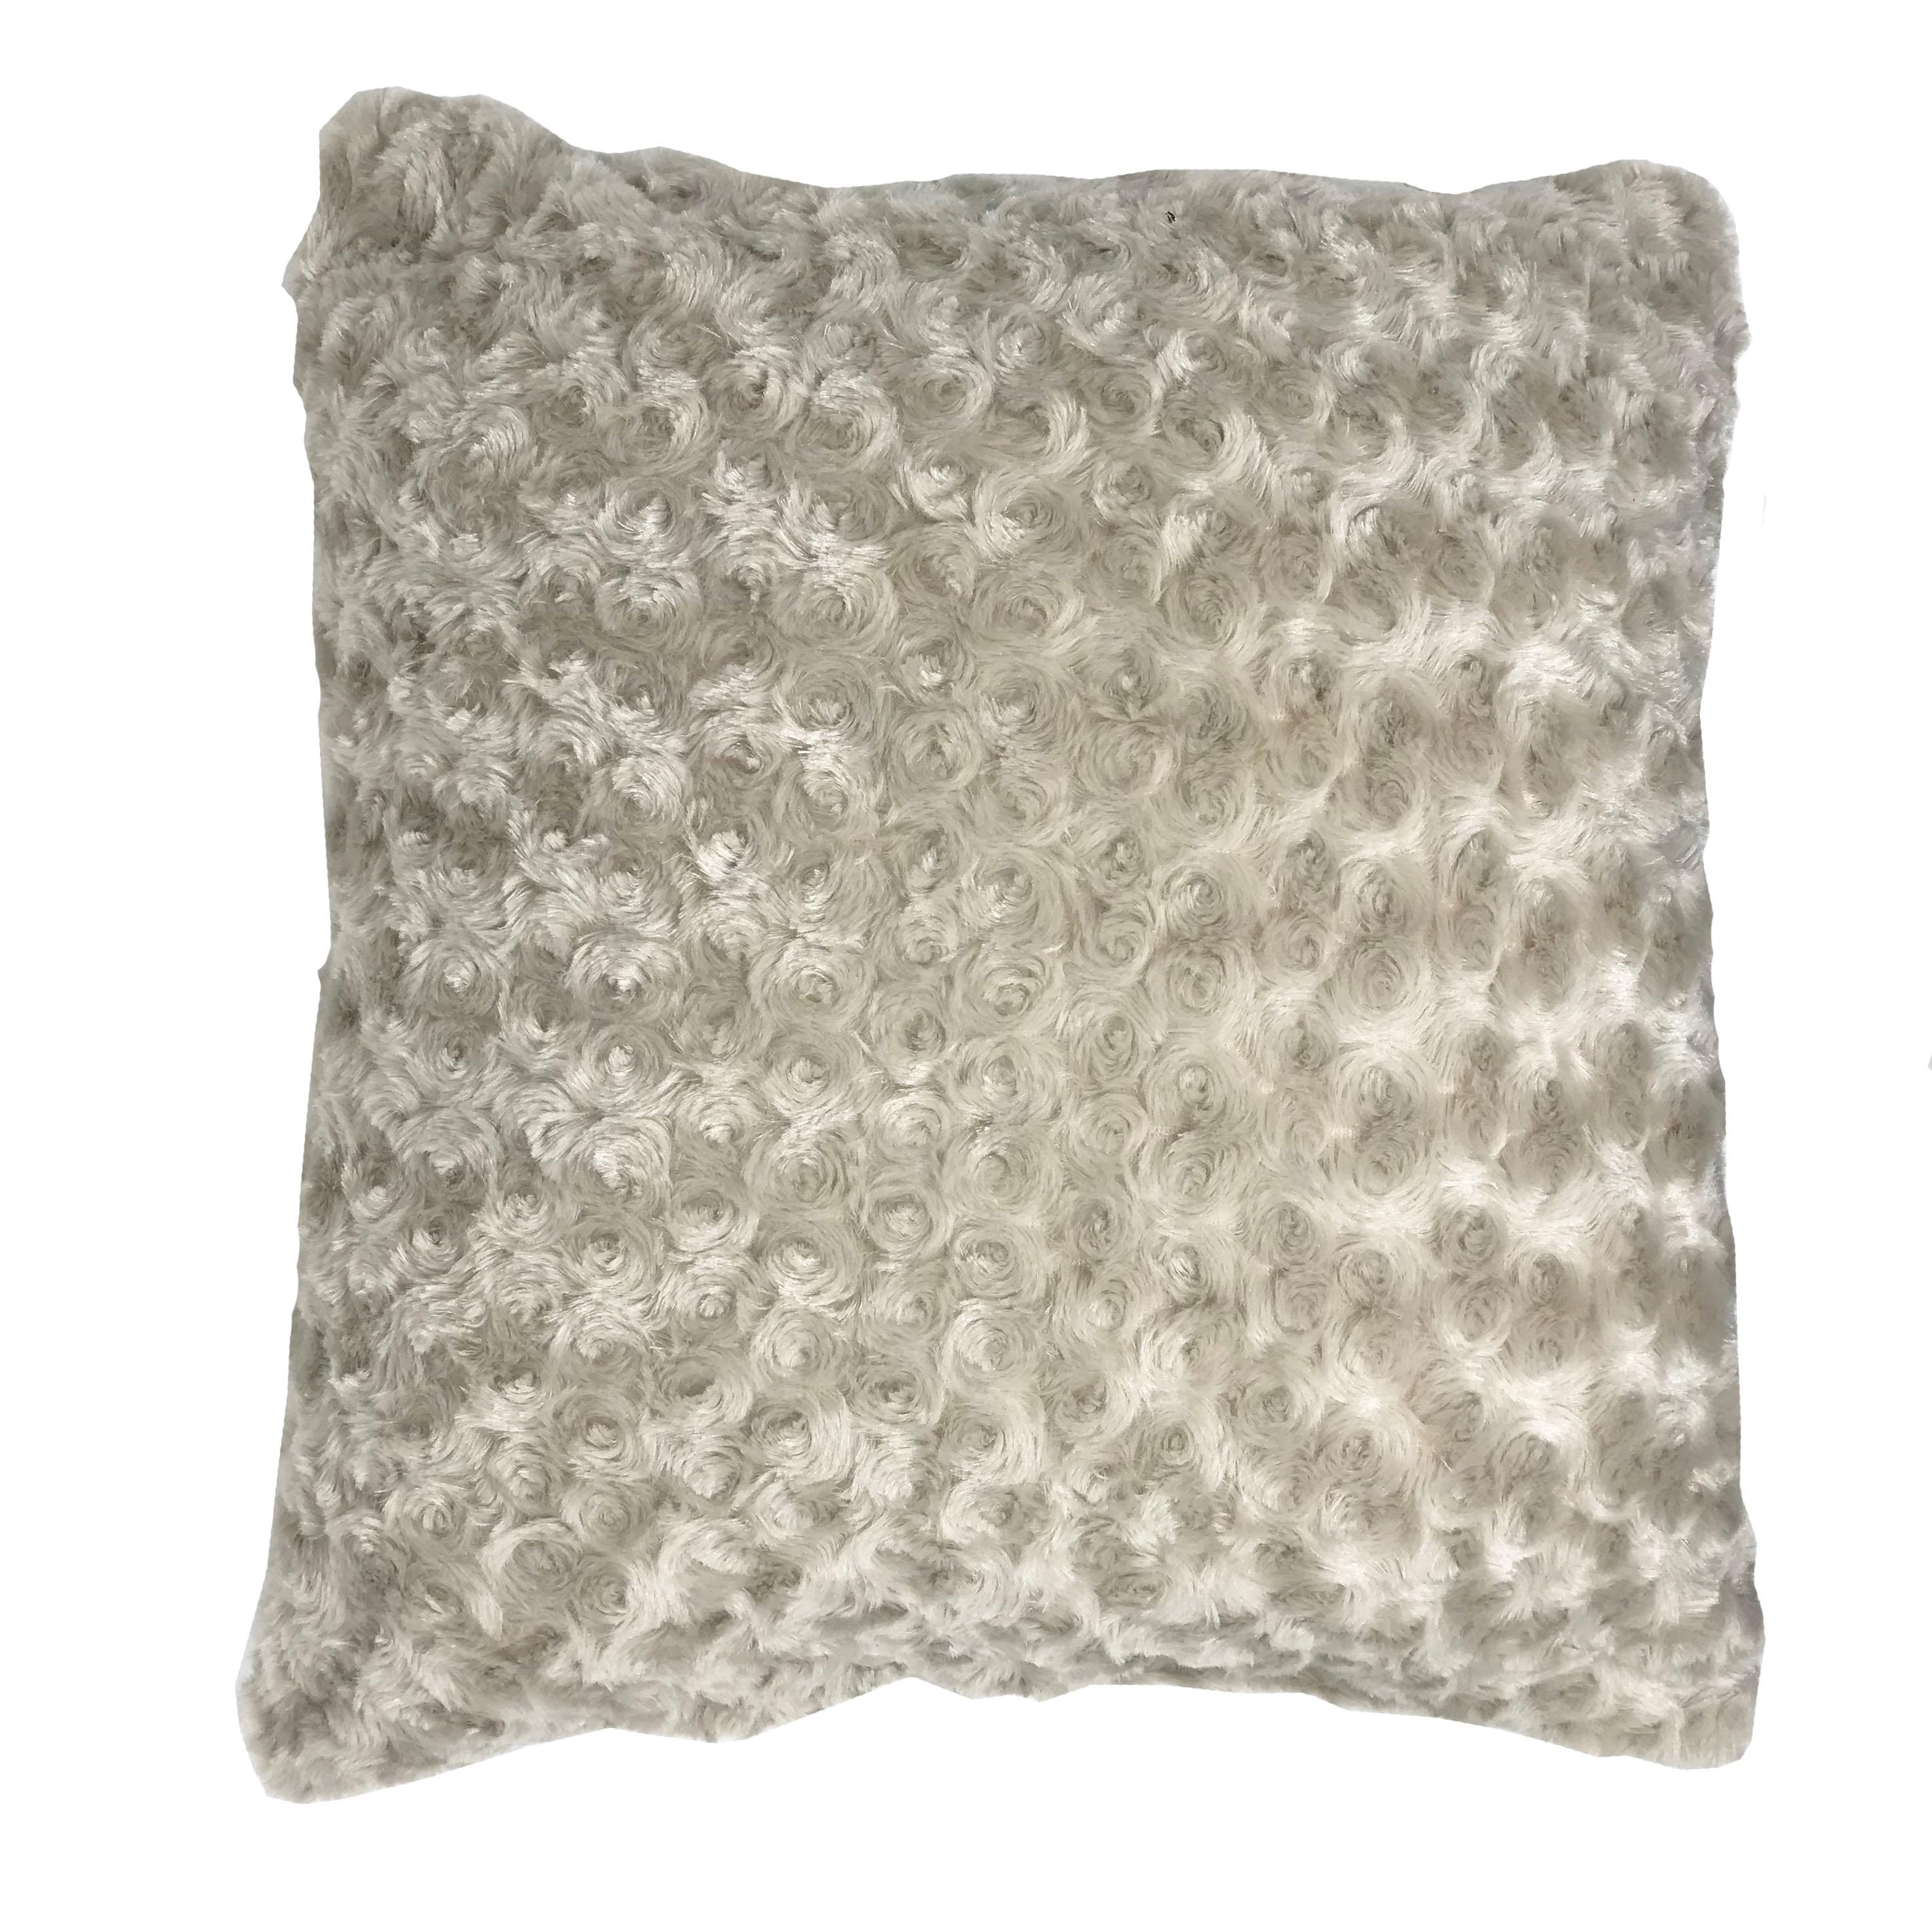 Luxury Swirl Faux Fur Grey 45cm x 45cm Hollowfibre Bounce Back Filled Cushion